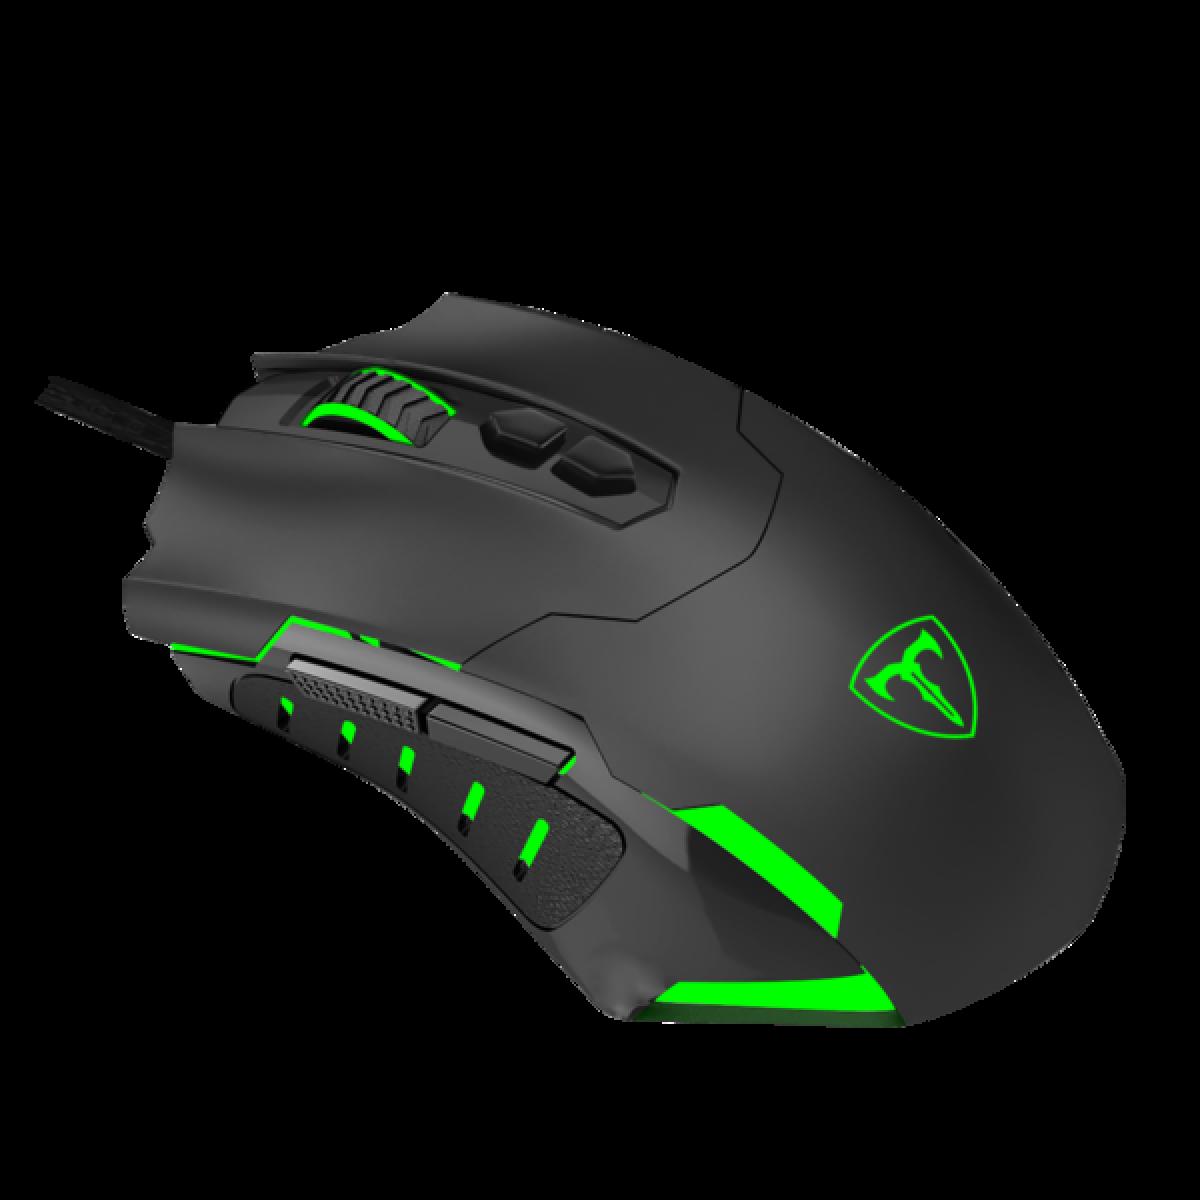 Mouse Gamer T-Dagger Brigadier RGB, 7200DPI, 7 Botões Programáveis, Black, T-TGM206